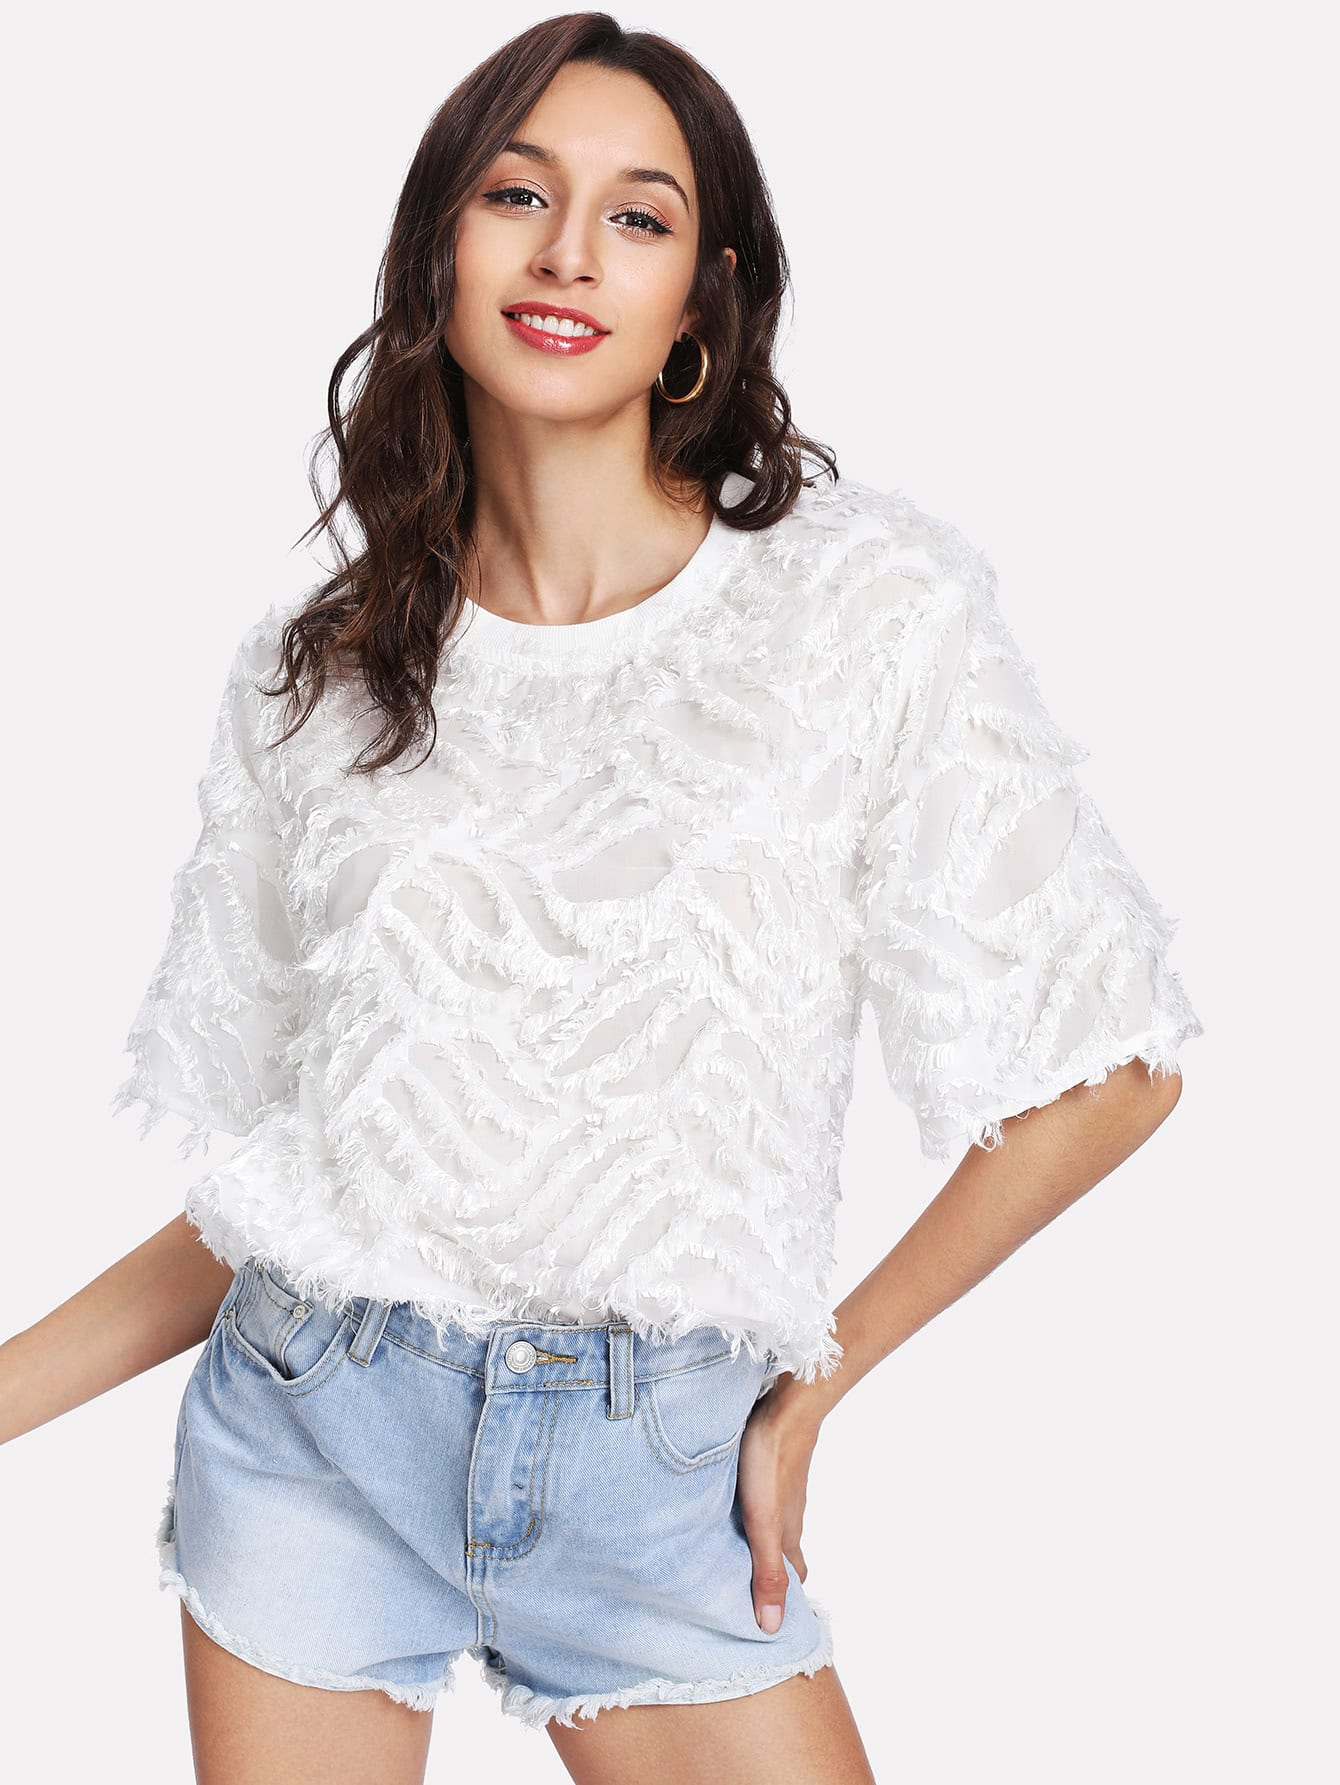 Short Sleeve Fringe Jacquard Top fringe sleeve top